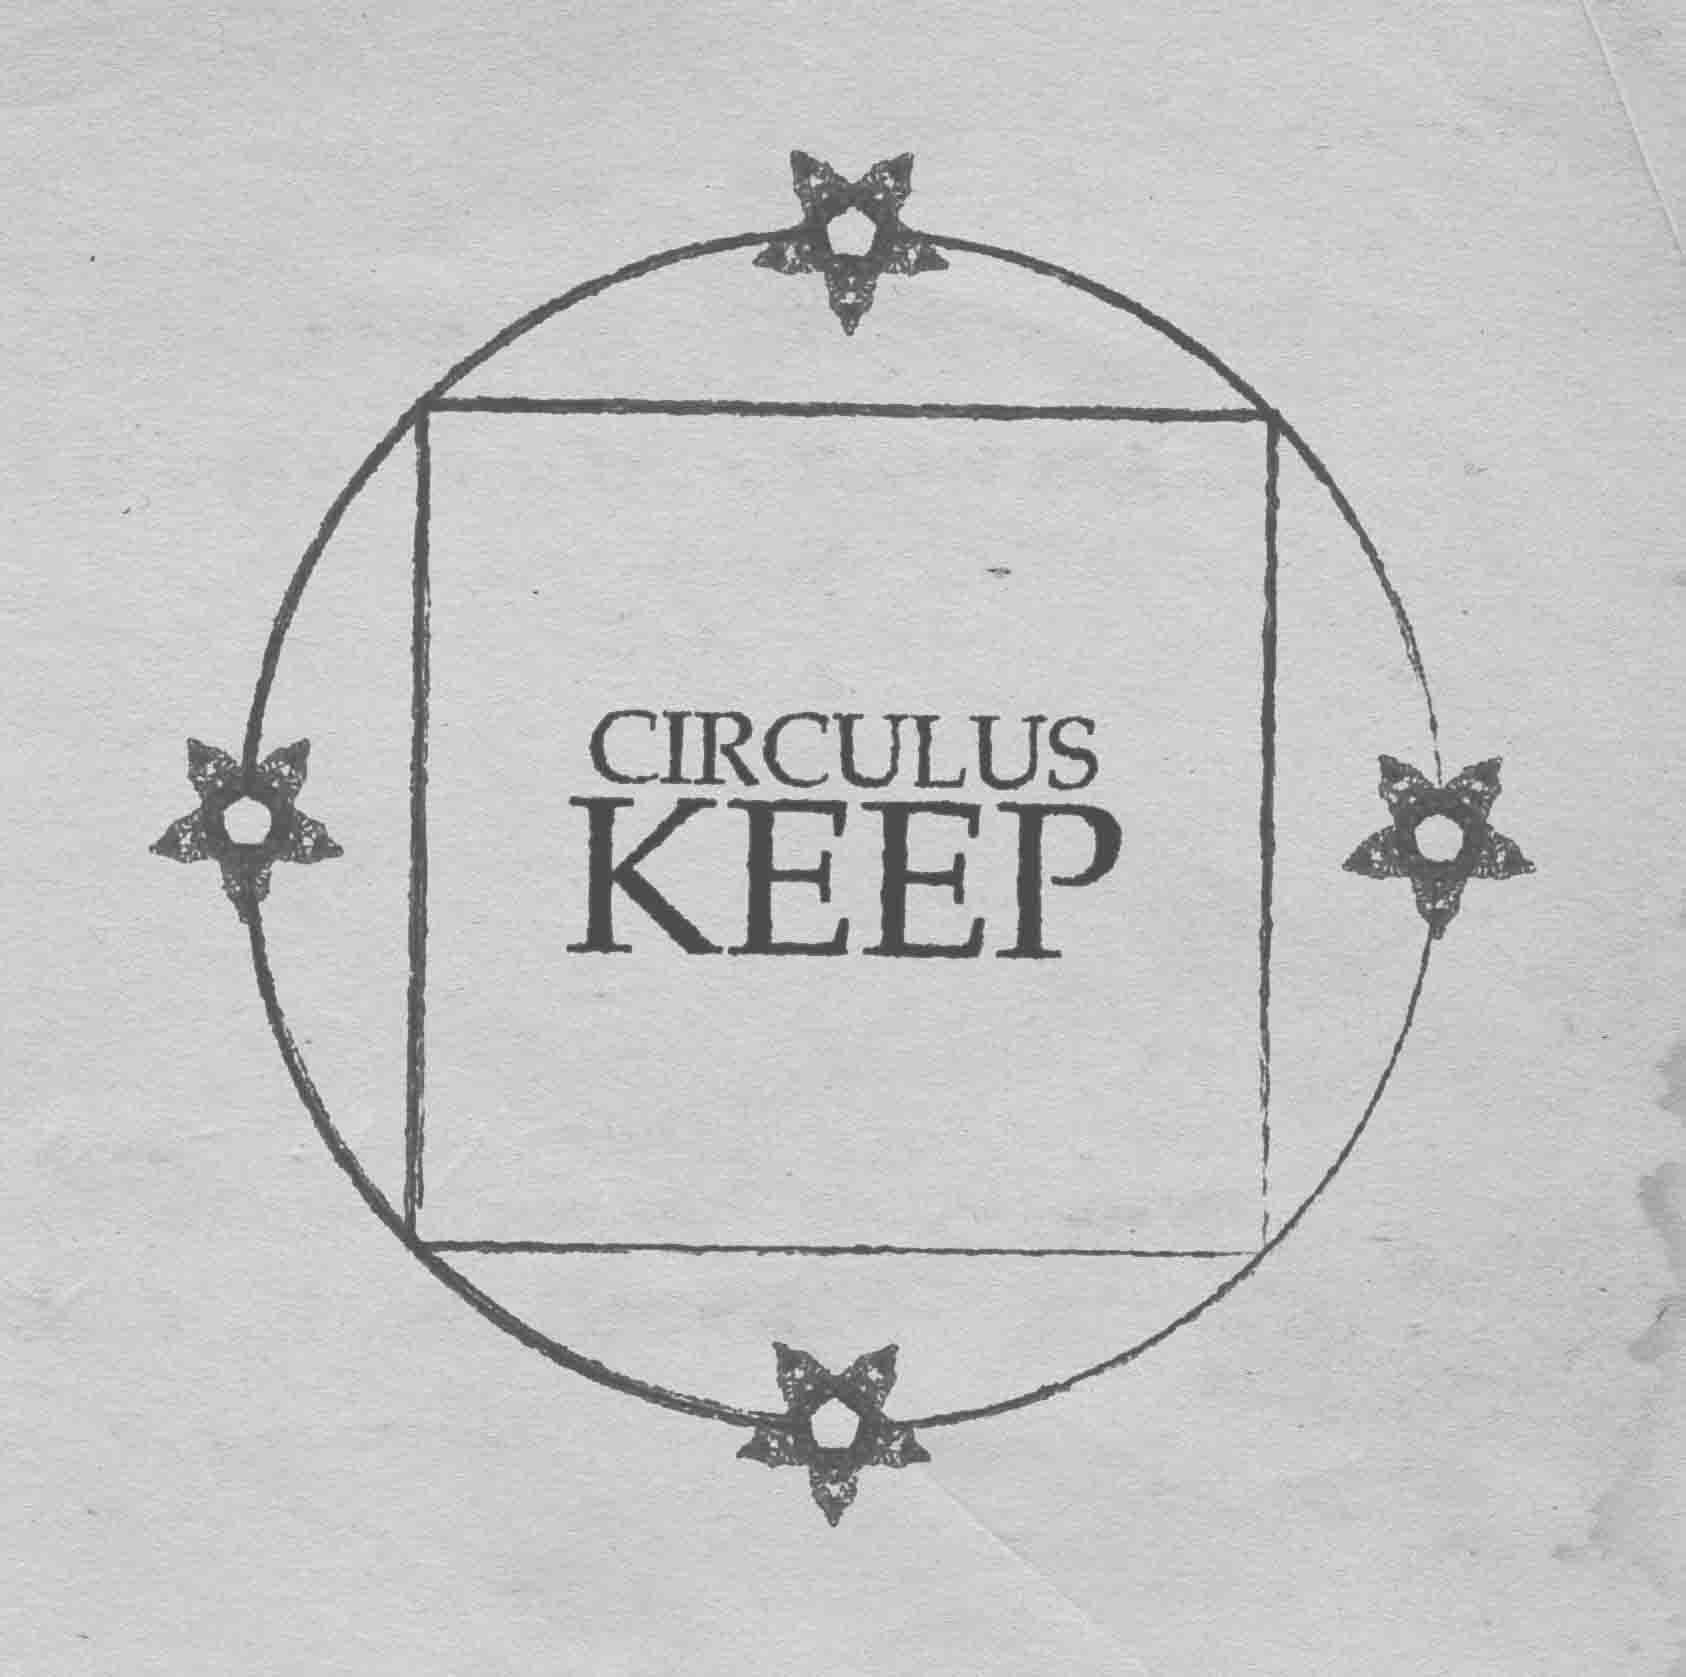 Circulus Keep